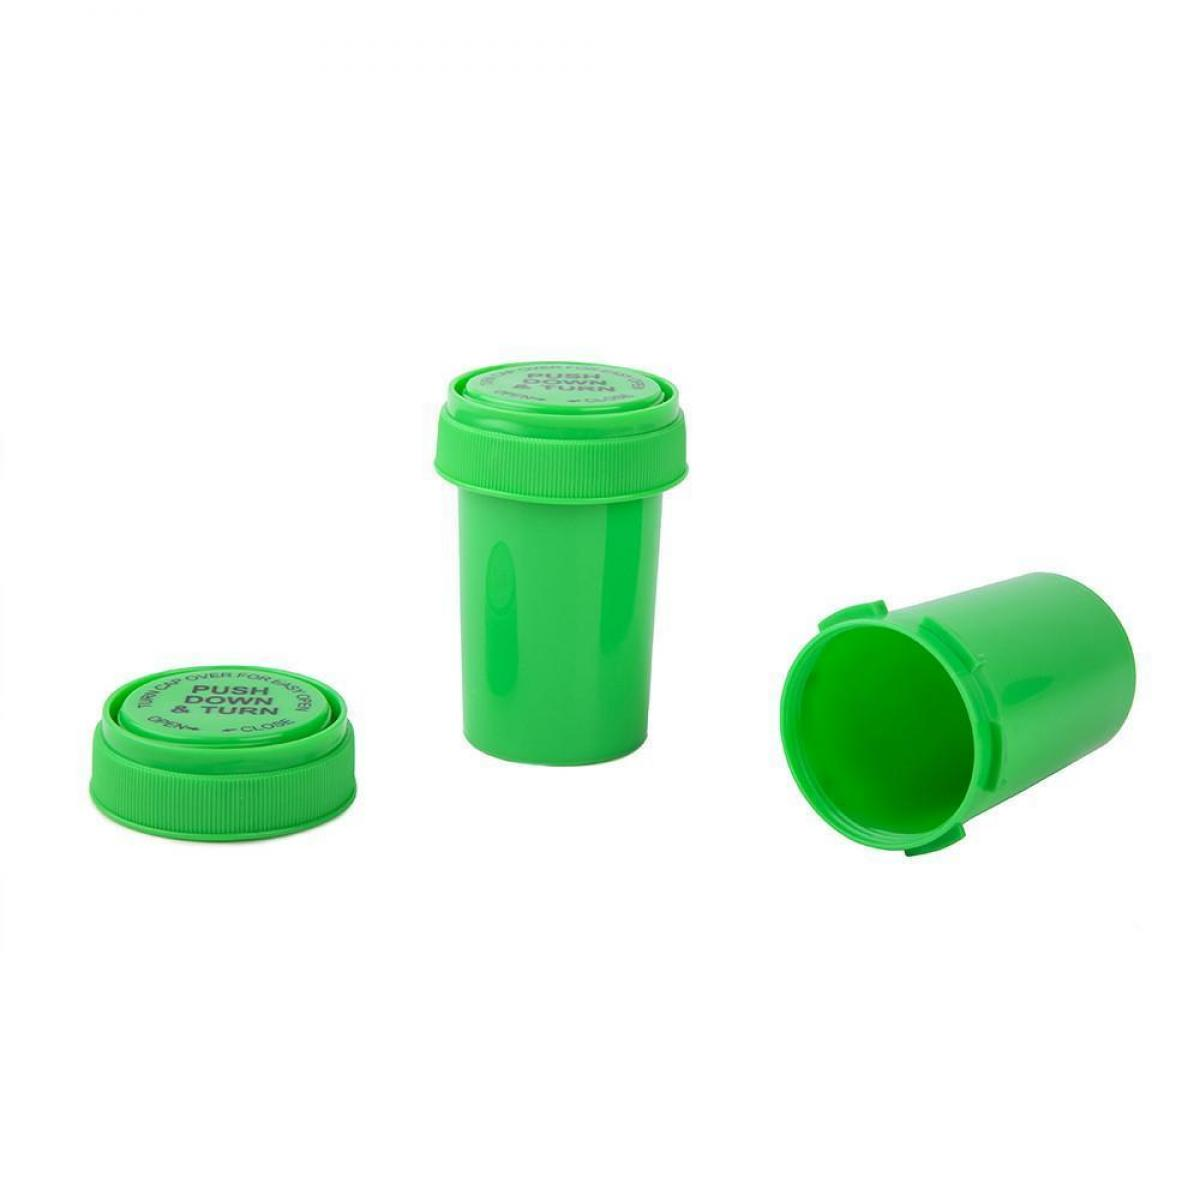 Reversible Cap Plastic Container (3.5g) Green